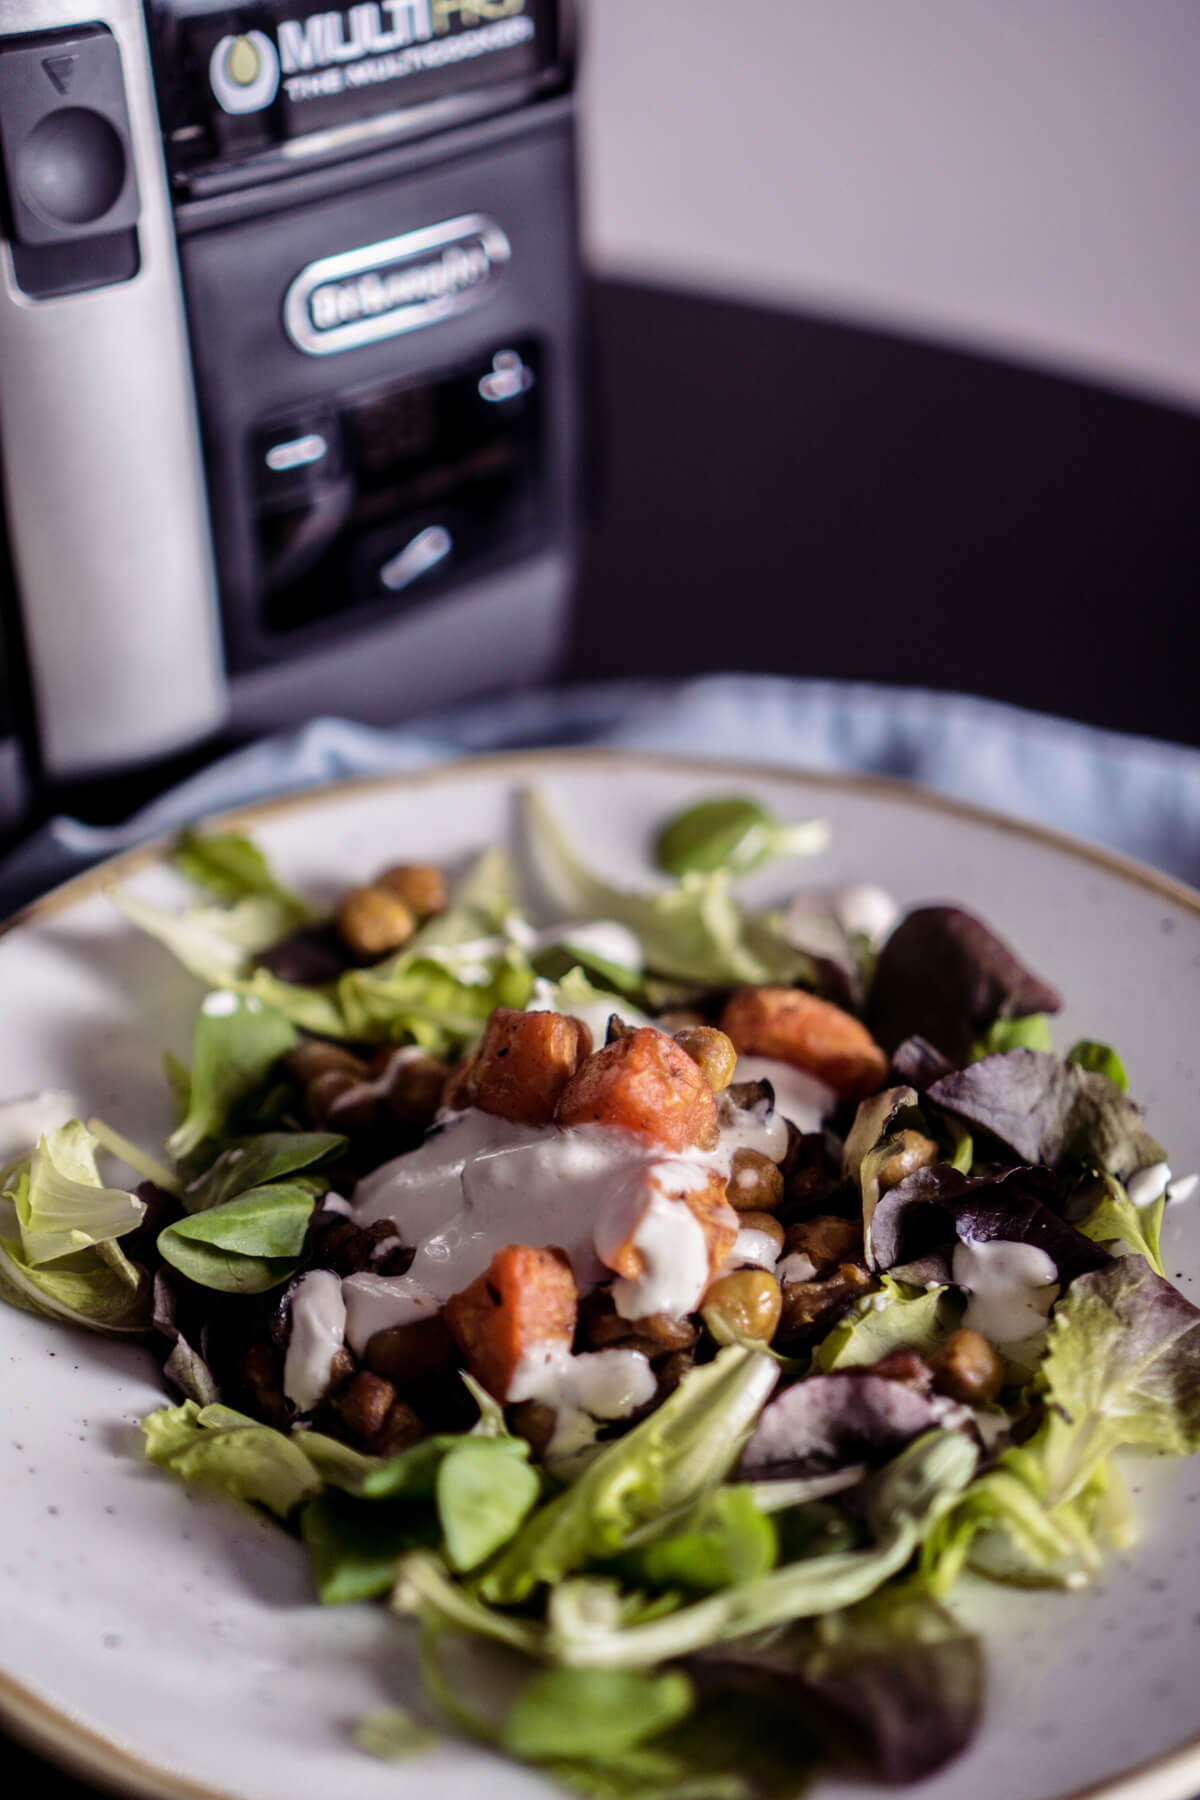 Saisonal kochen: Herbst, Salat mit Süßkartoffeln, Melanzani, Kichererbsen und Tahinidressing